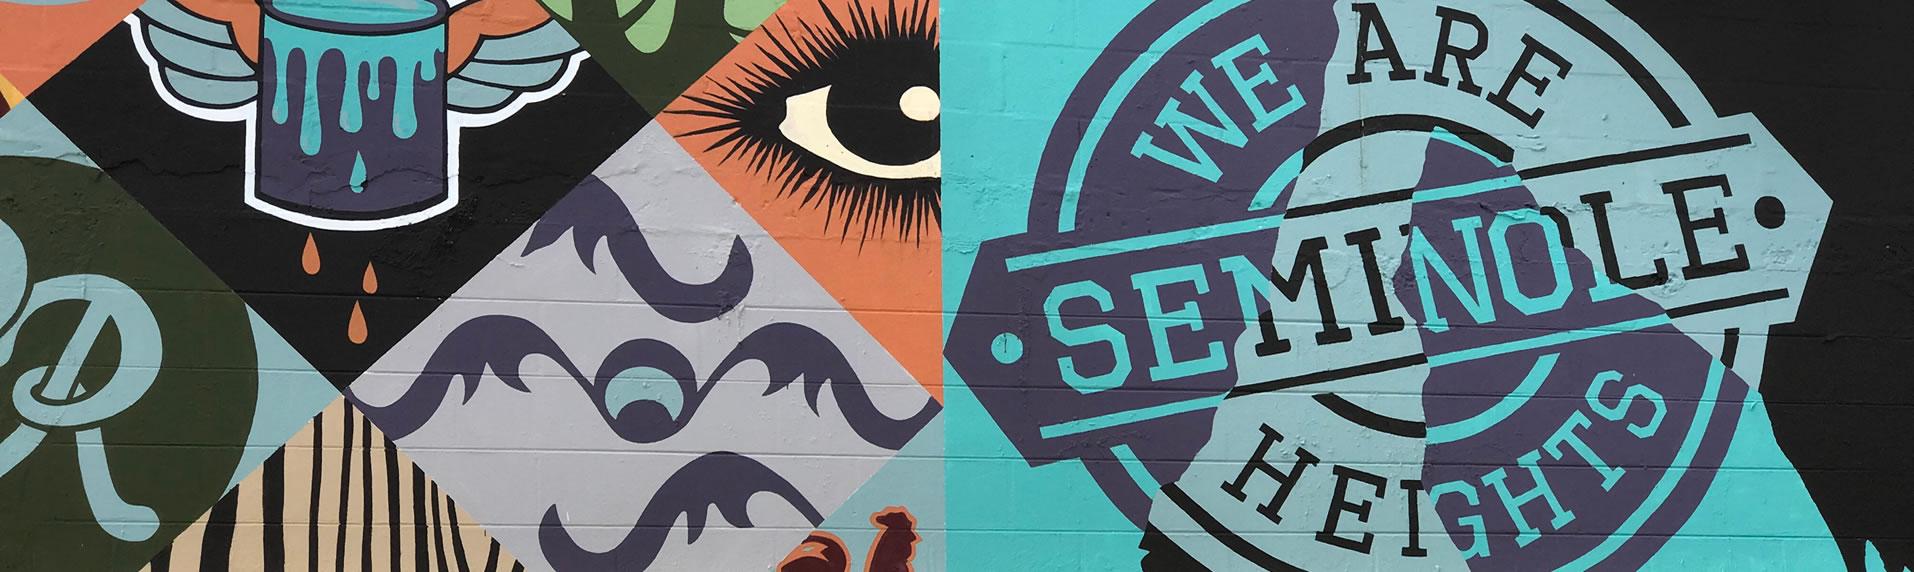 Seminole Heights wall mural